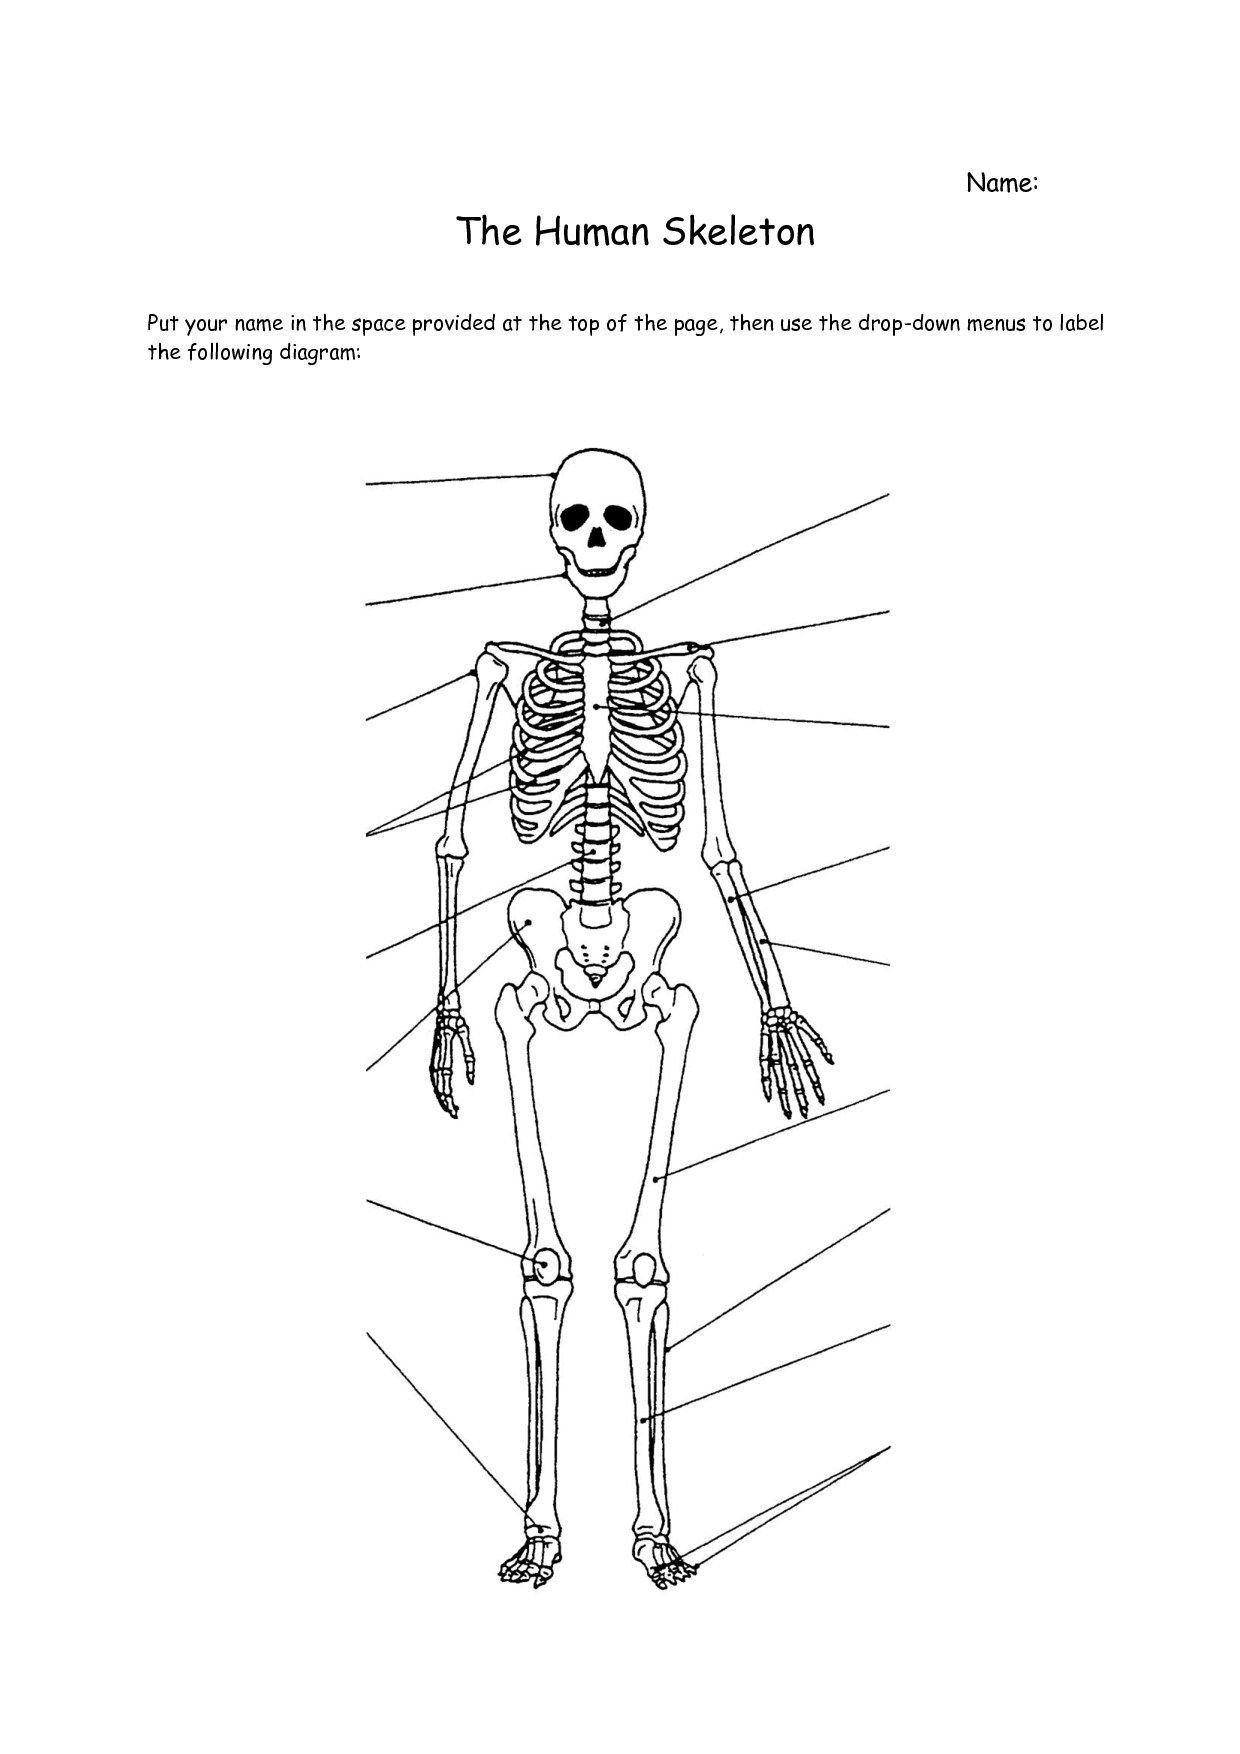 Appendicular Skeleton Worksheet Answers Pin On Printable Blank Worksheet Template